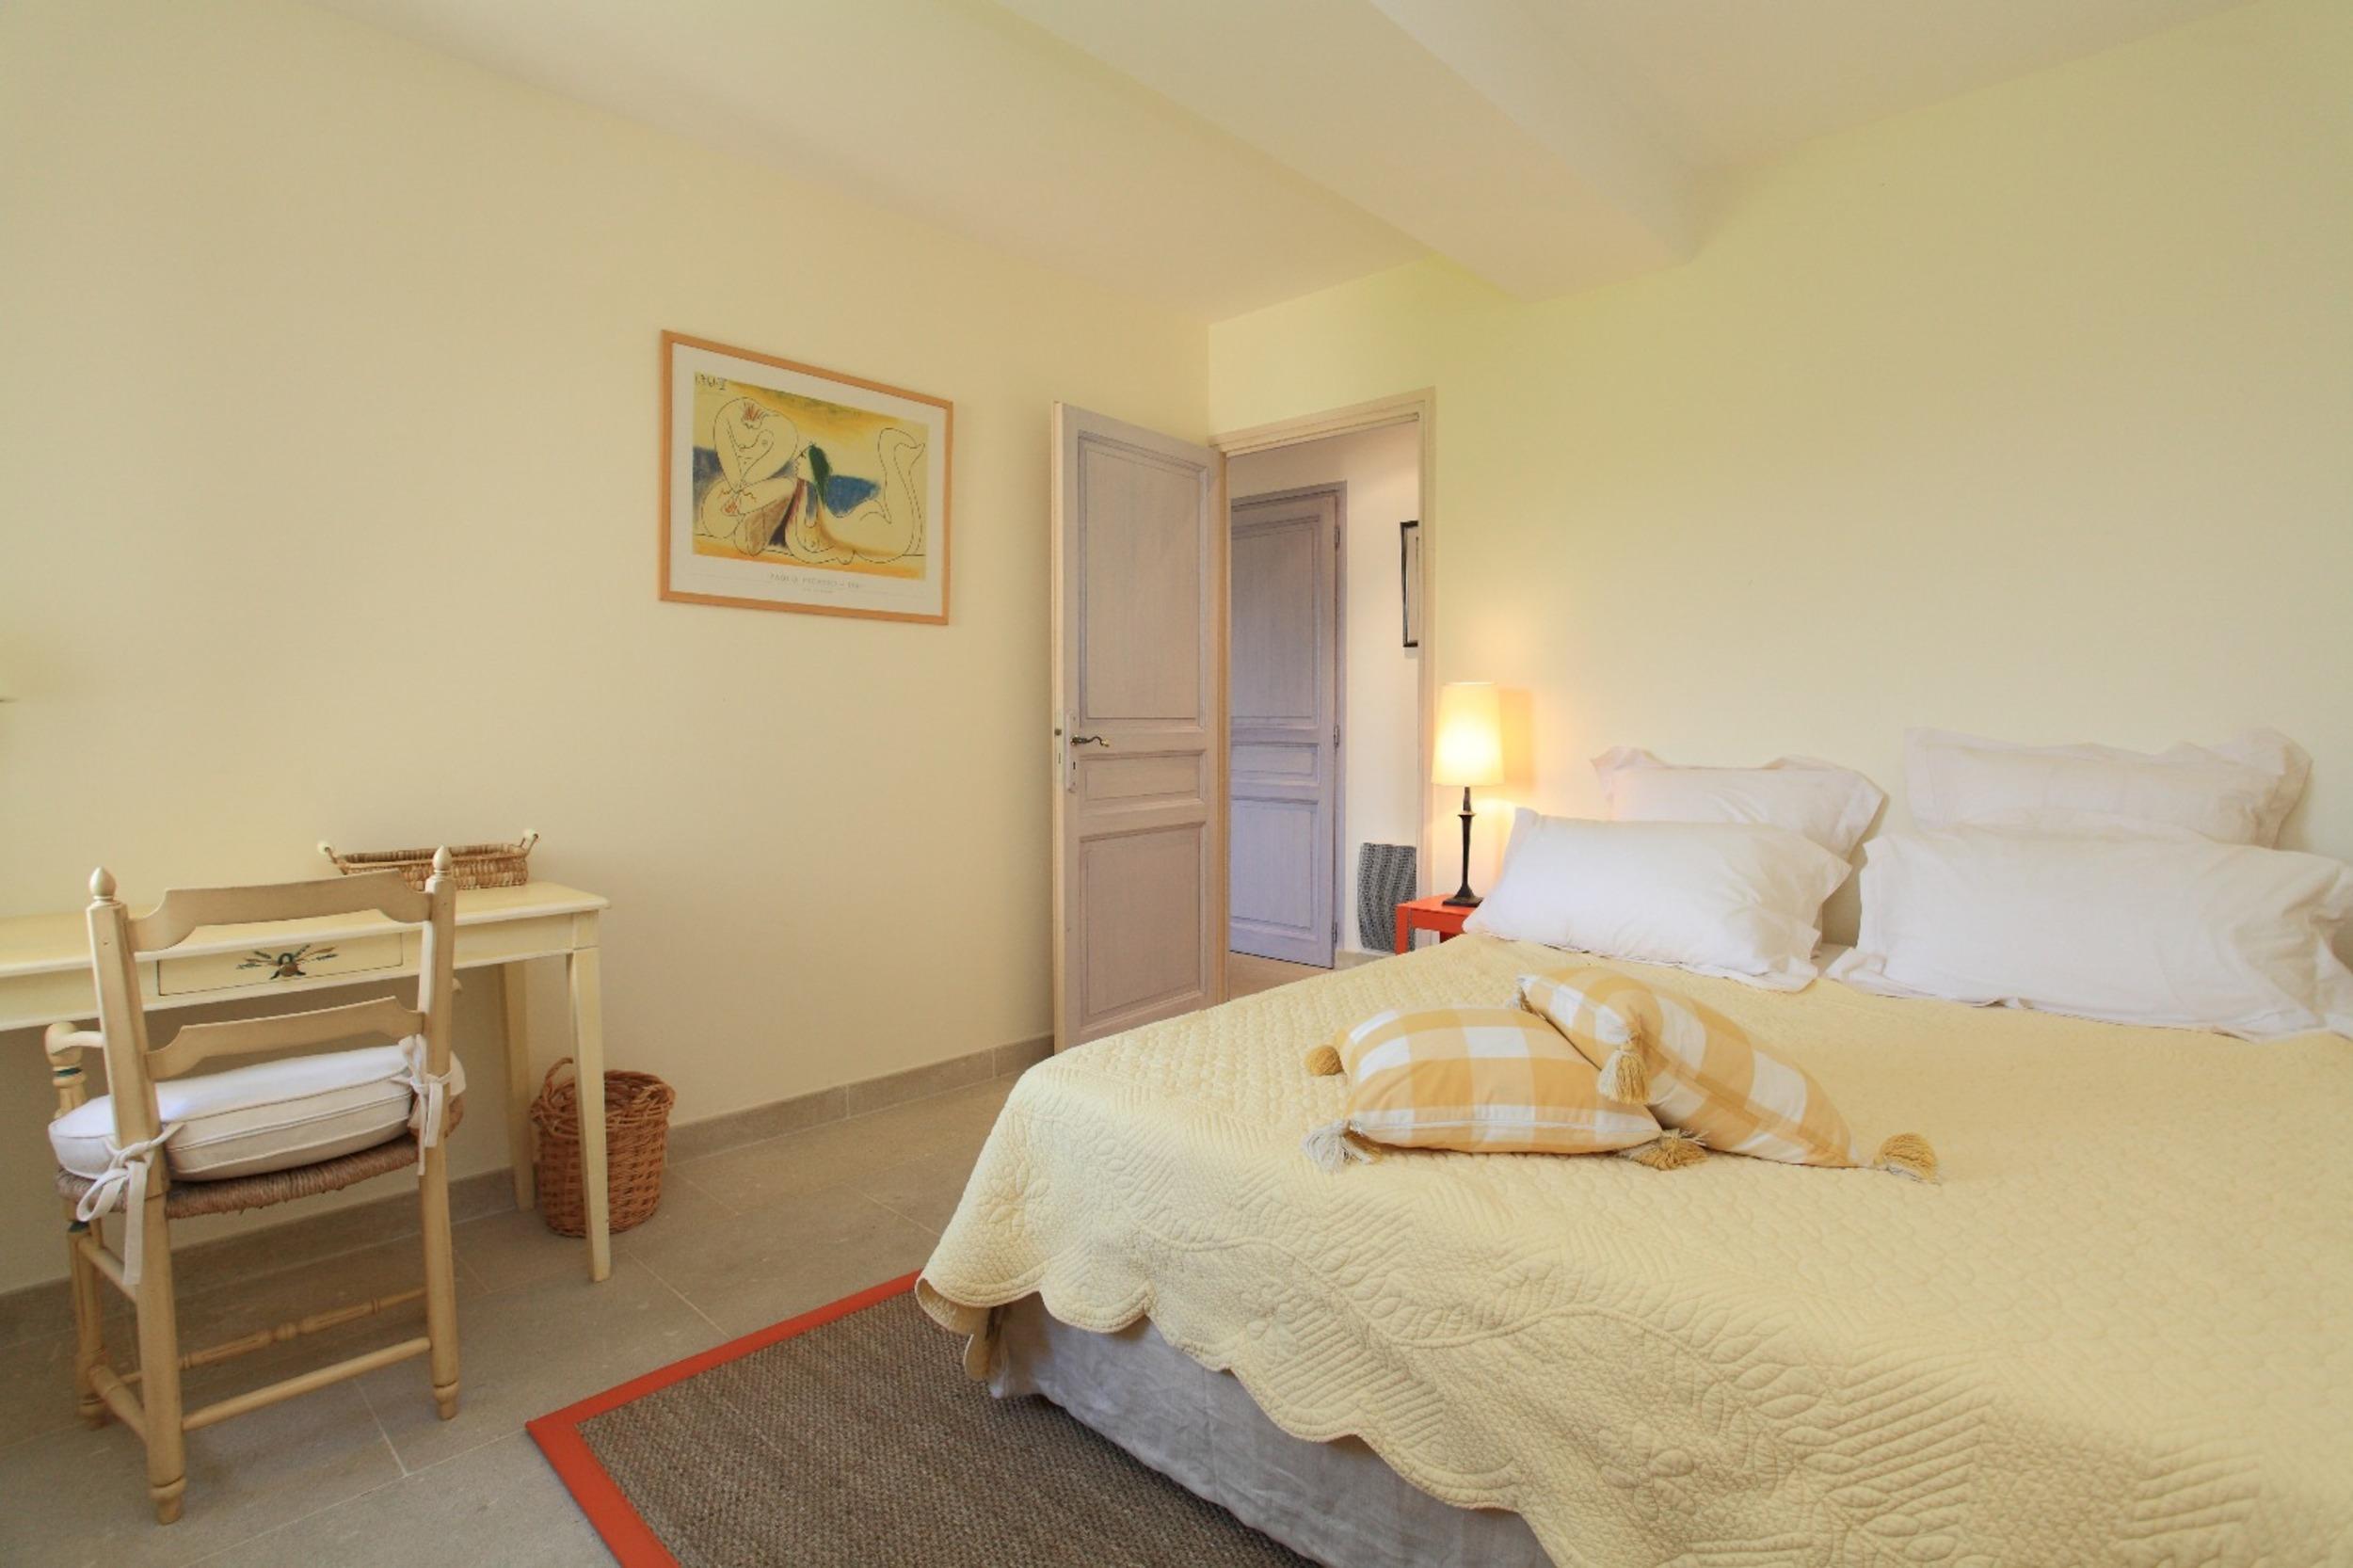 Holiday house Der Fall - Fabelhaftes Landhaus in Gordes (2520443), Gordes, Vaucluse, Provence - Alps - Côte d'Azur, France, picture 16